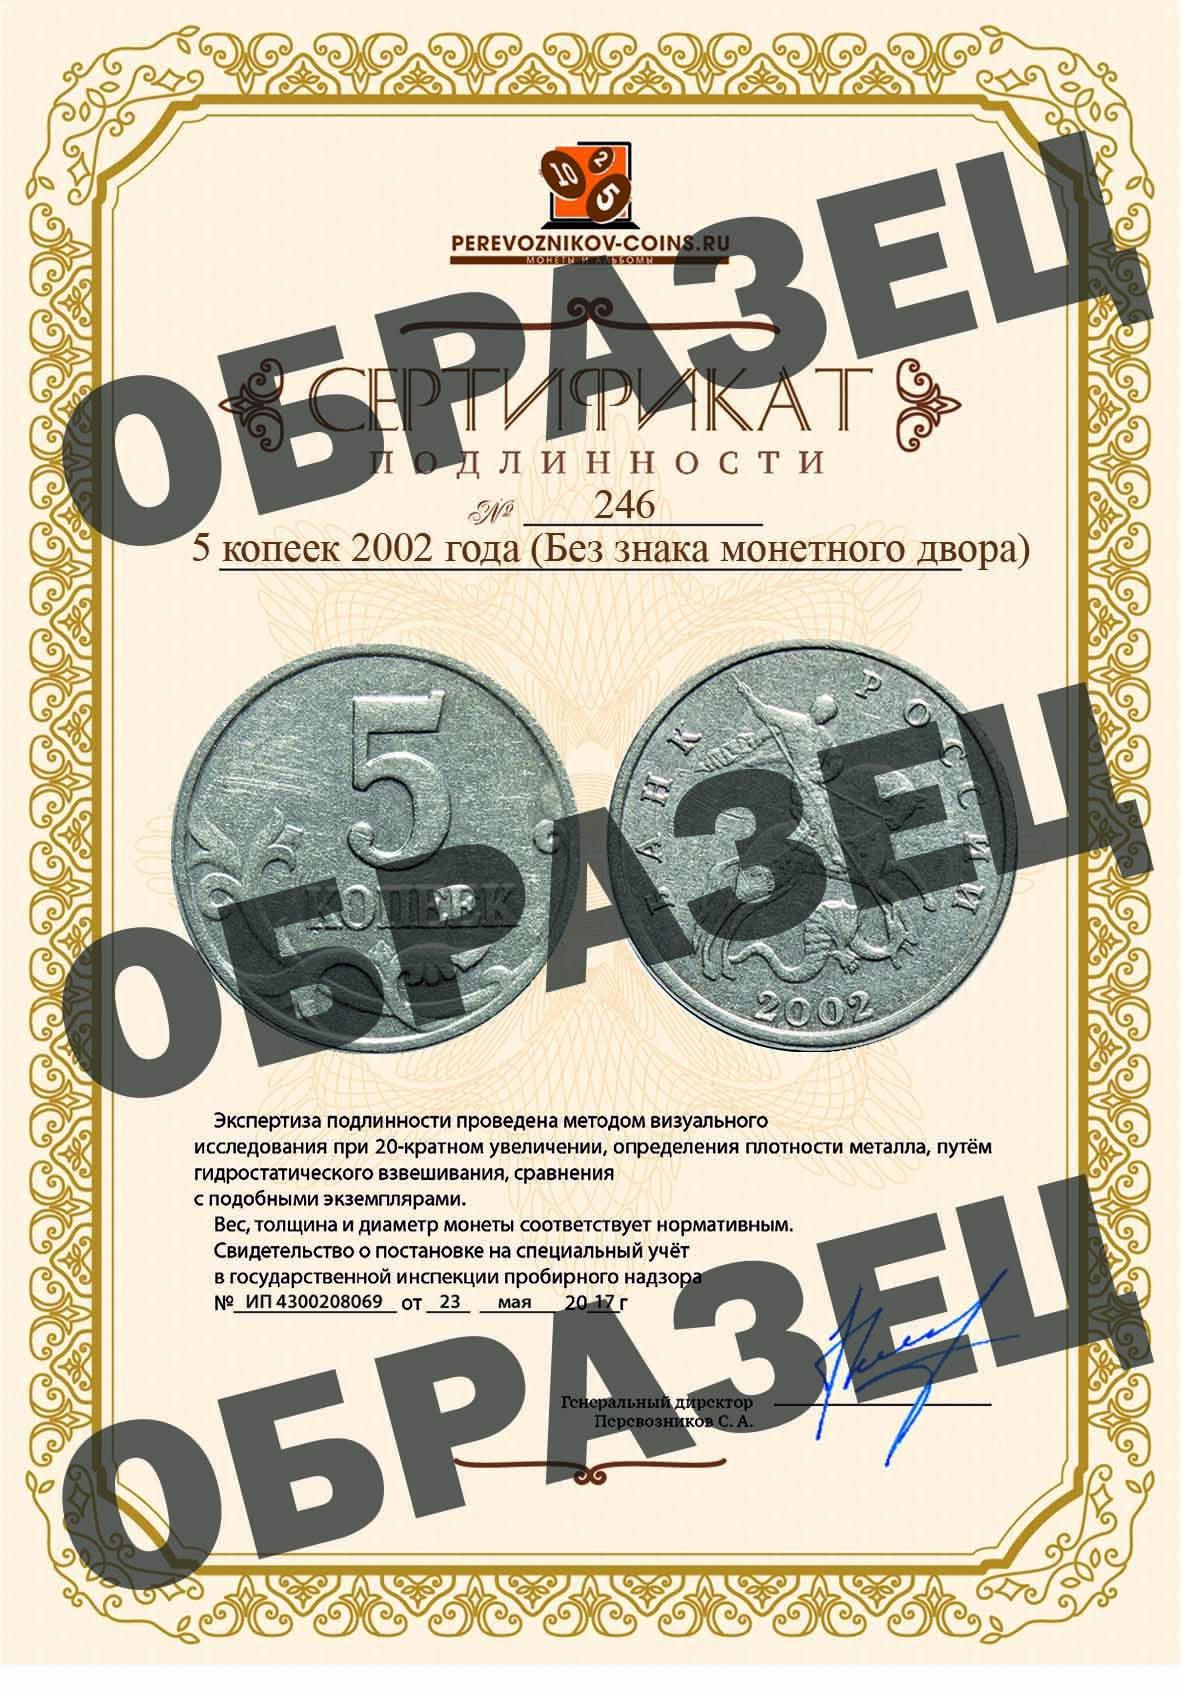 5 копеек 2002 года (Без знака монетного двора)